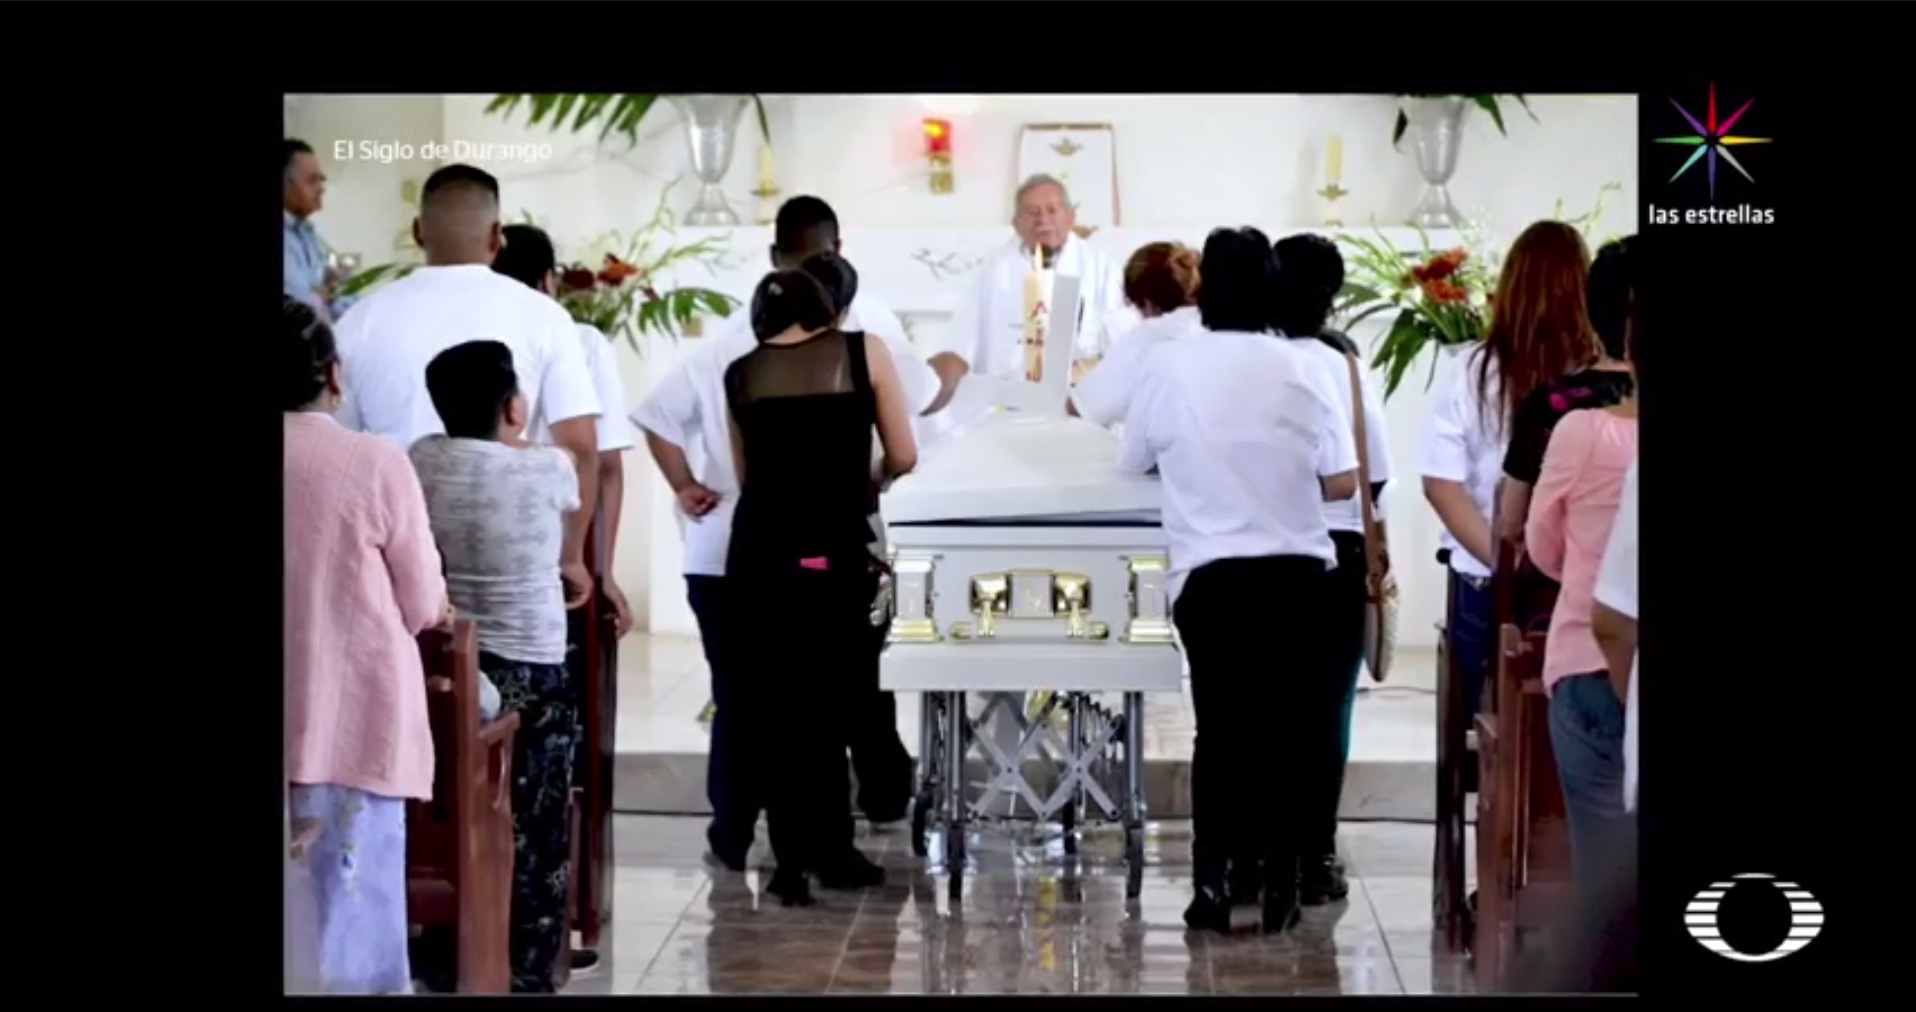 Jonathan murió en un tiroteo en San Bernardino, California. (Noticieros Televisa)